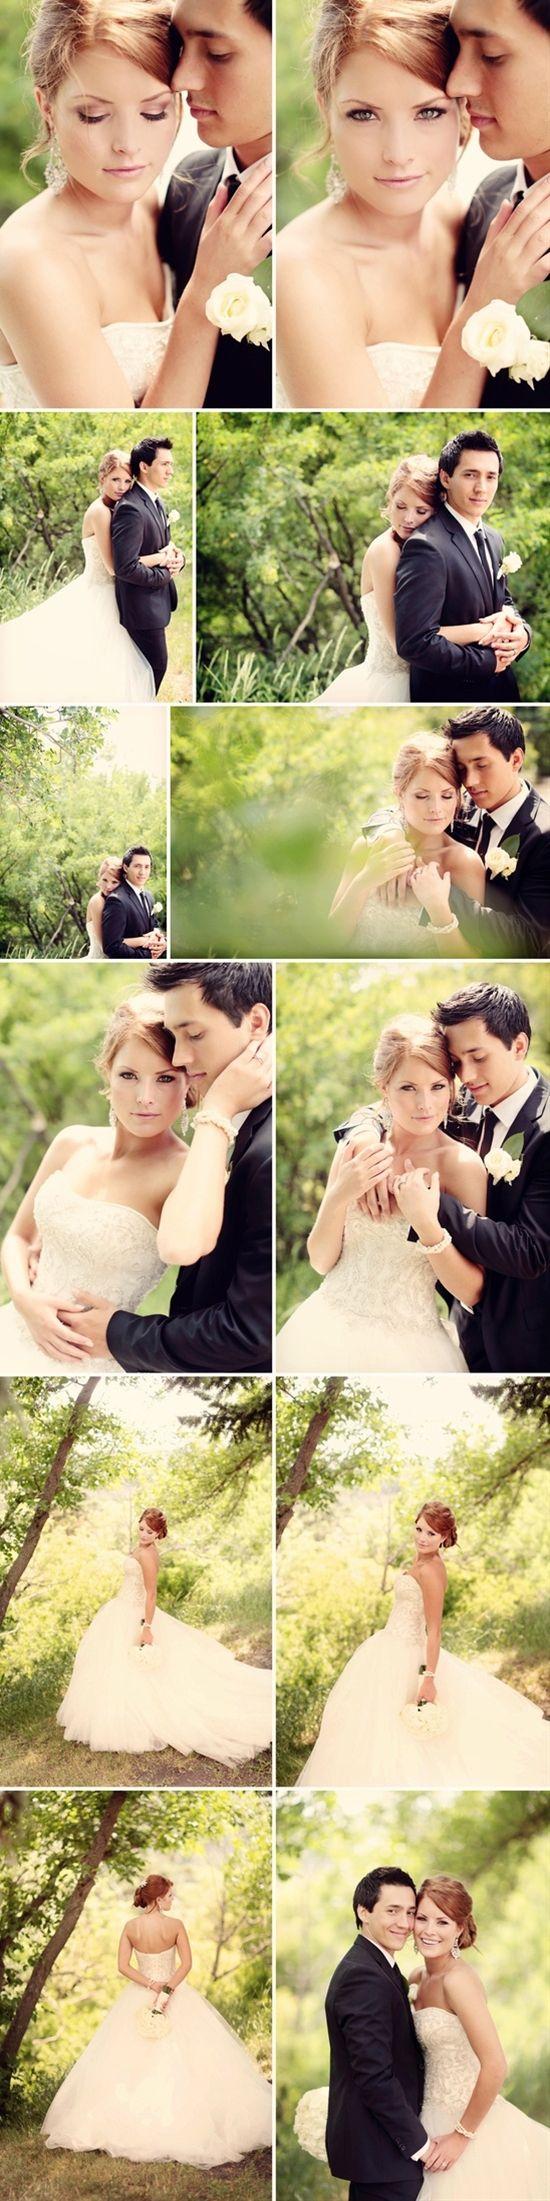 Edmonton Wedding Photographer Blog